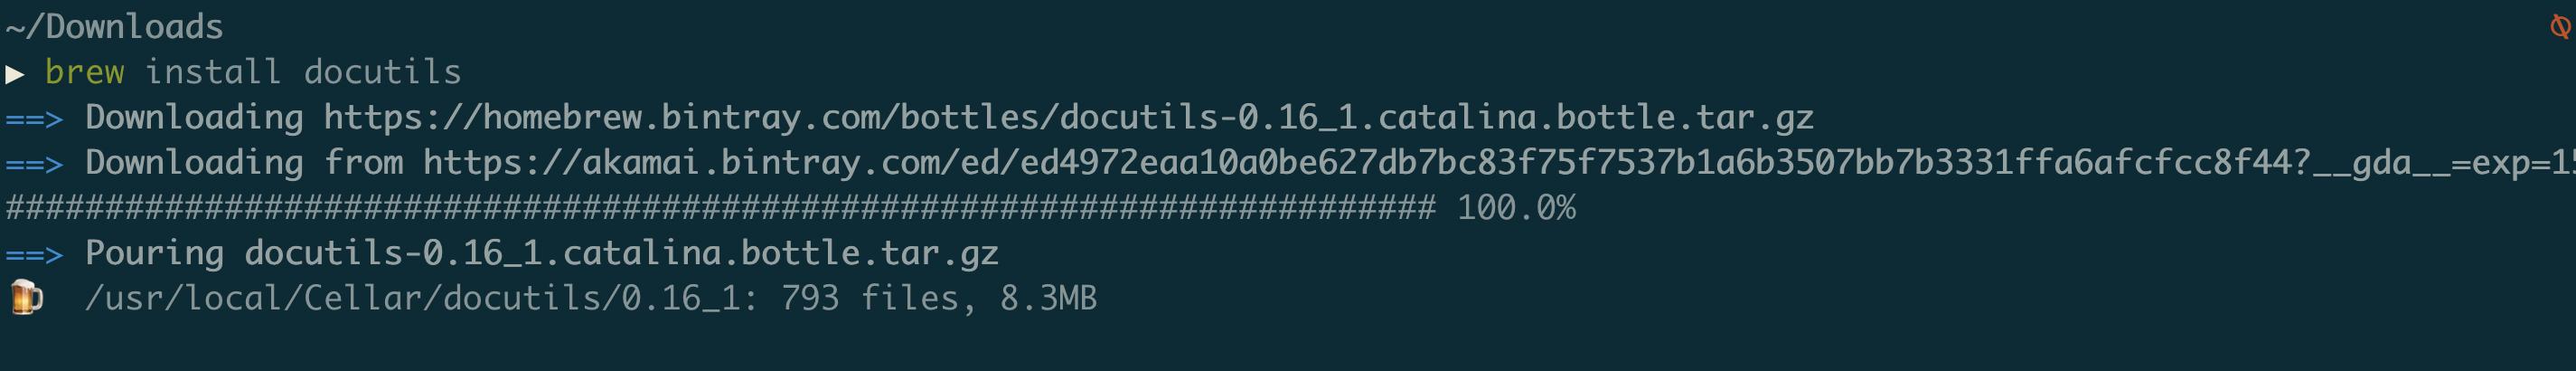 mpv_install_02.png